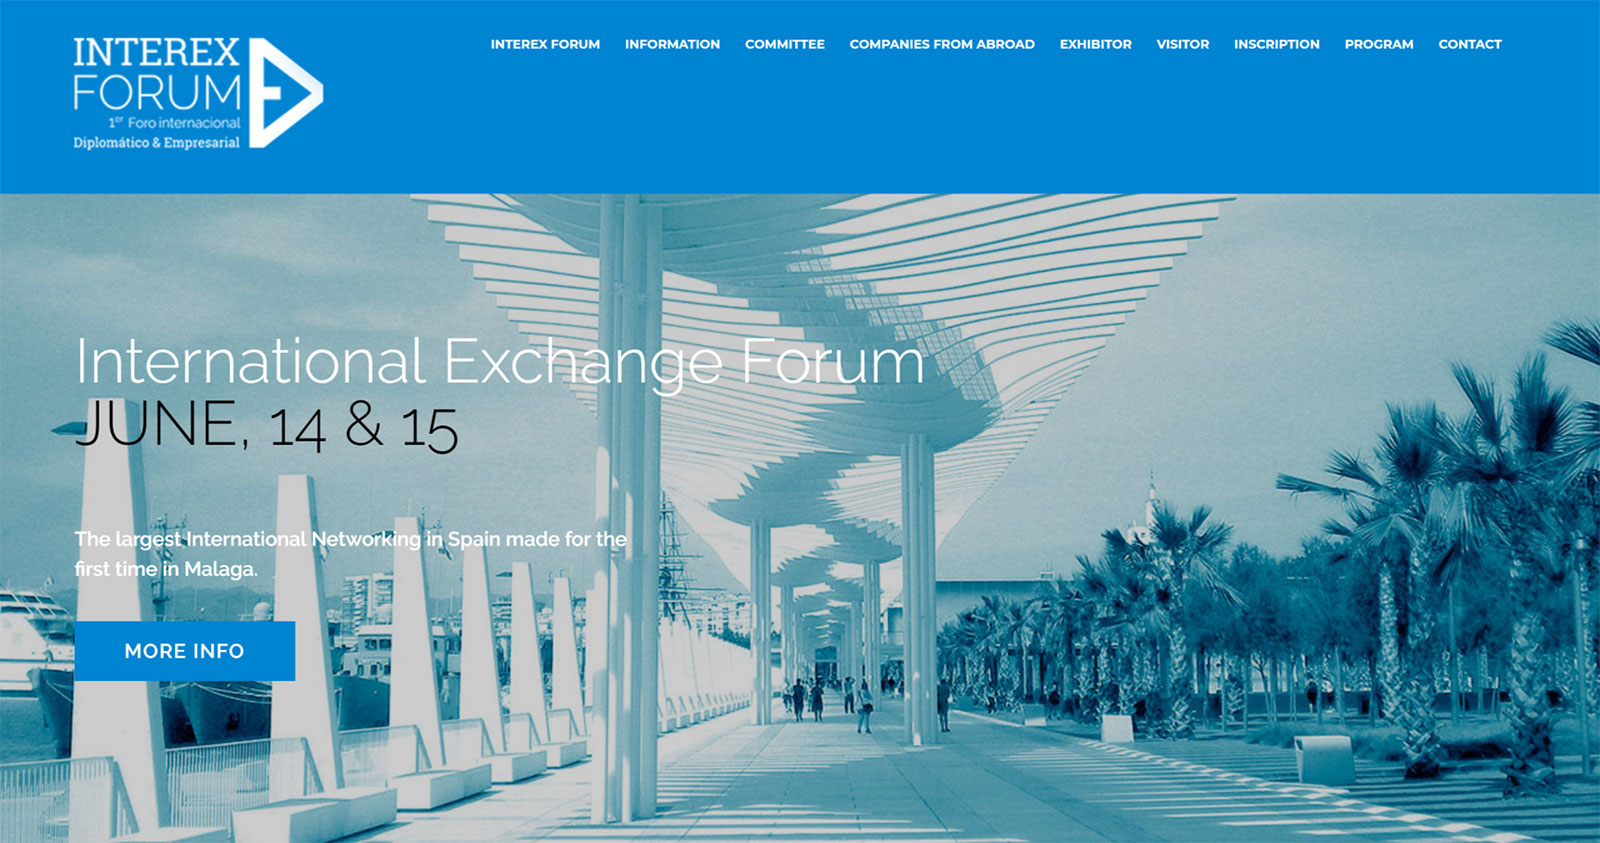 House of Balance® at Malaga Interex Forum